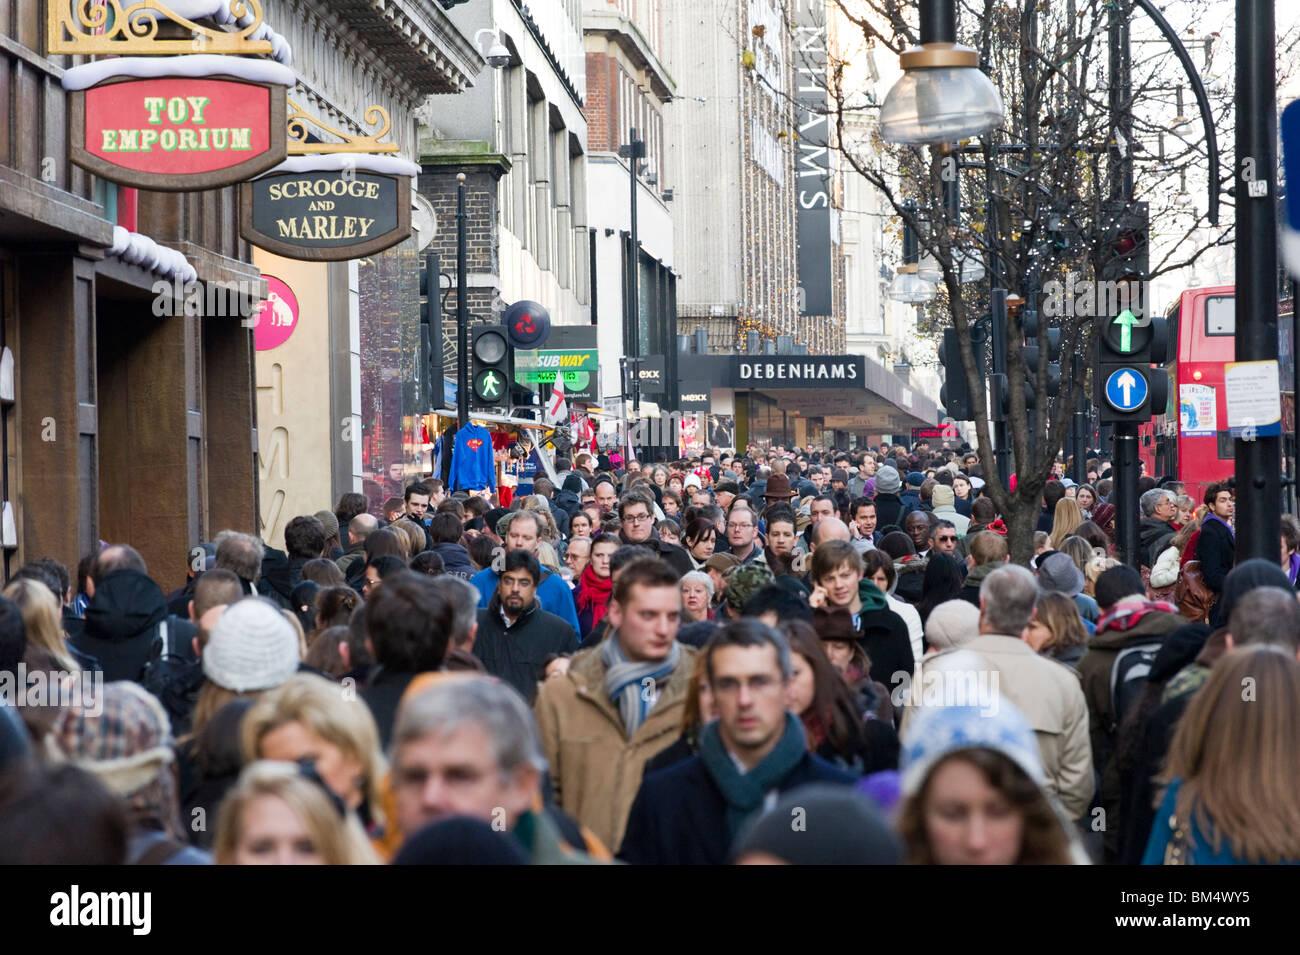 Christmas shoppers on Oxford Street, London, England, UK - Stock Image